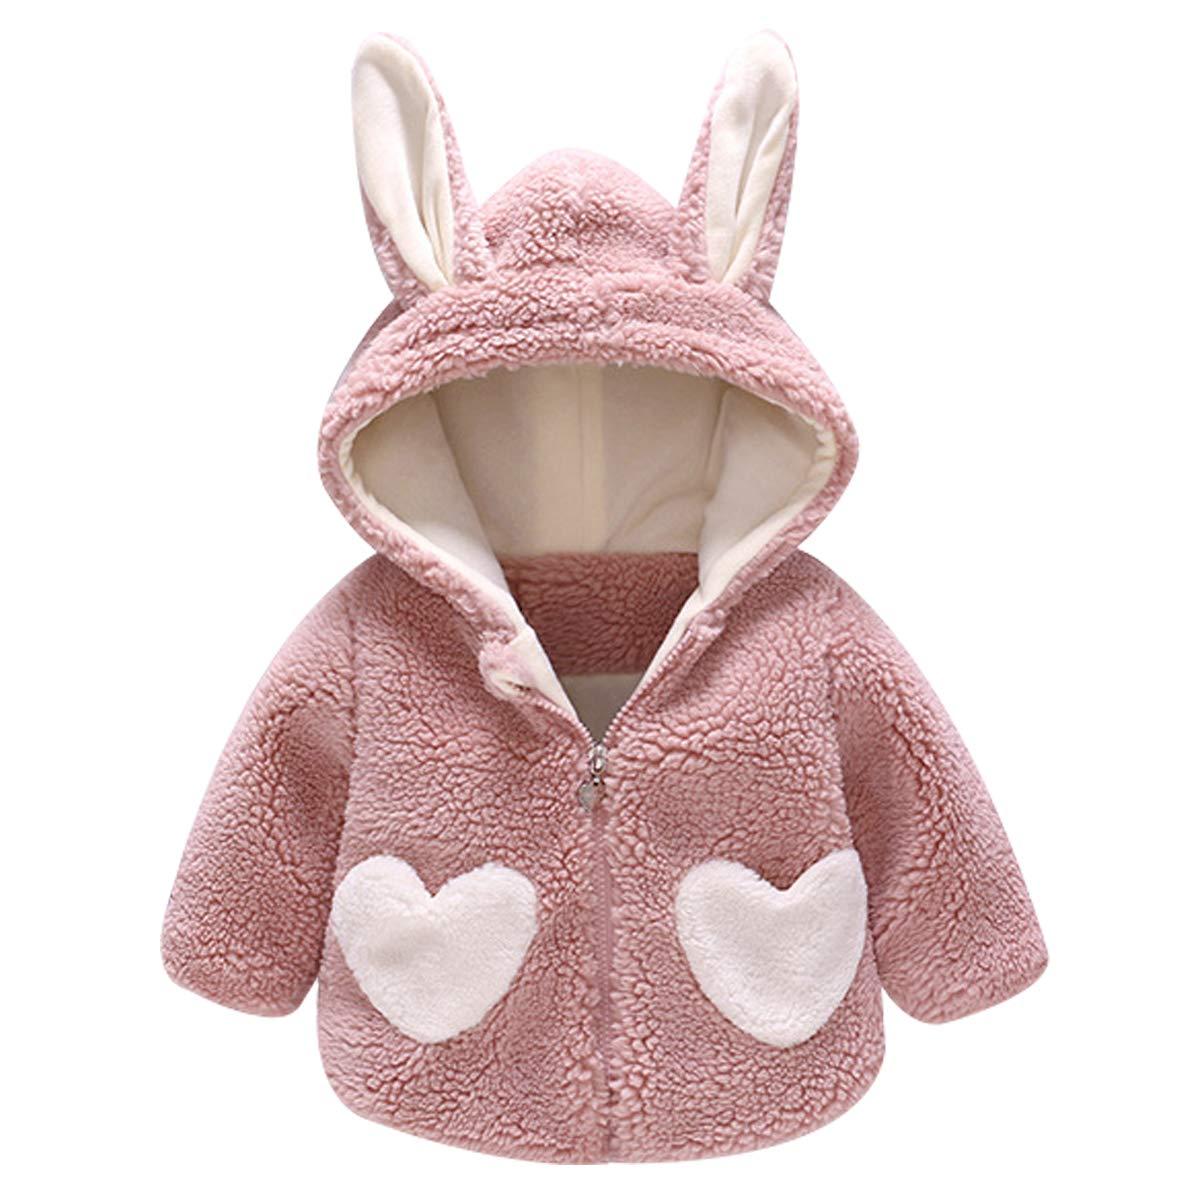 Kanodan Baby Girls Pretty Heart Fleece Jacket Winter Warm Pink Coat for Toddlers